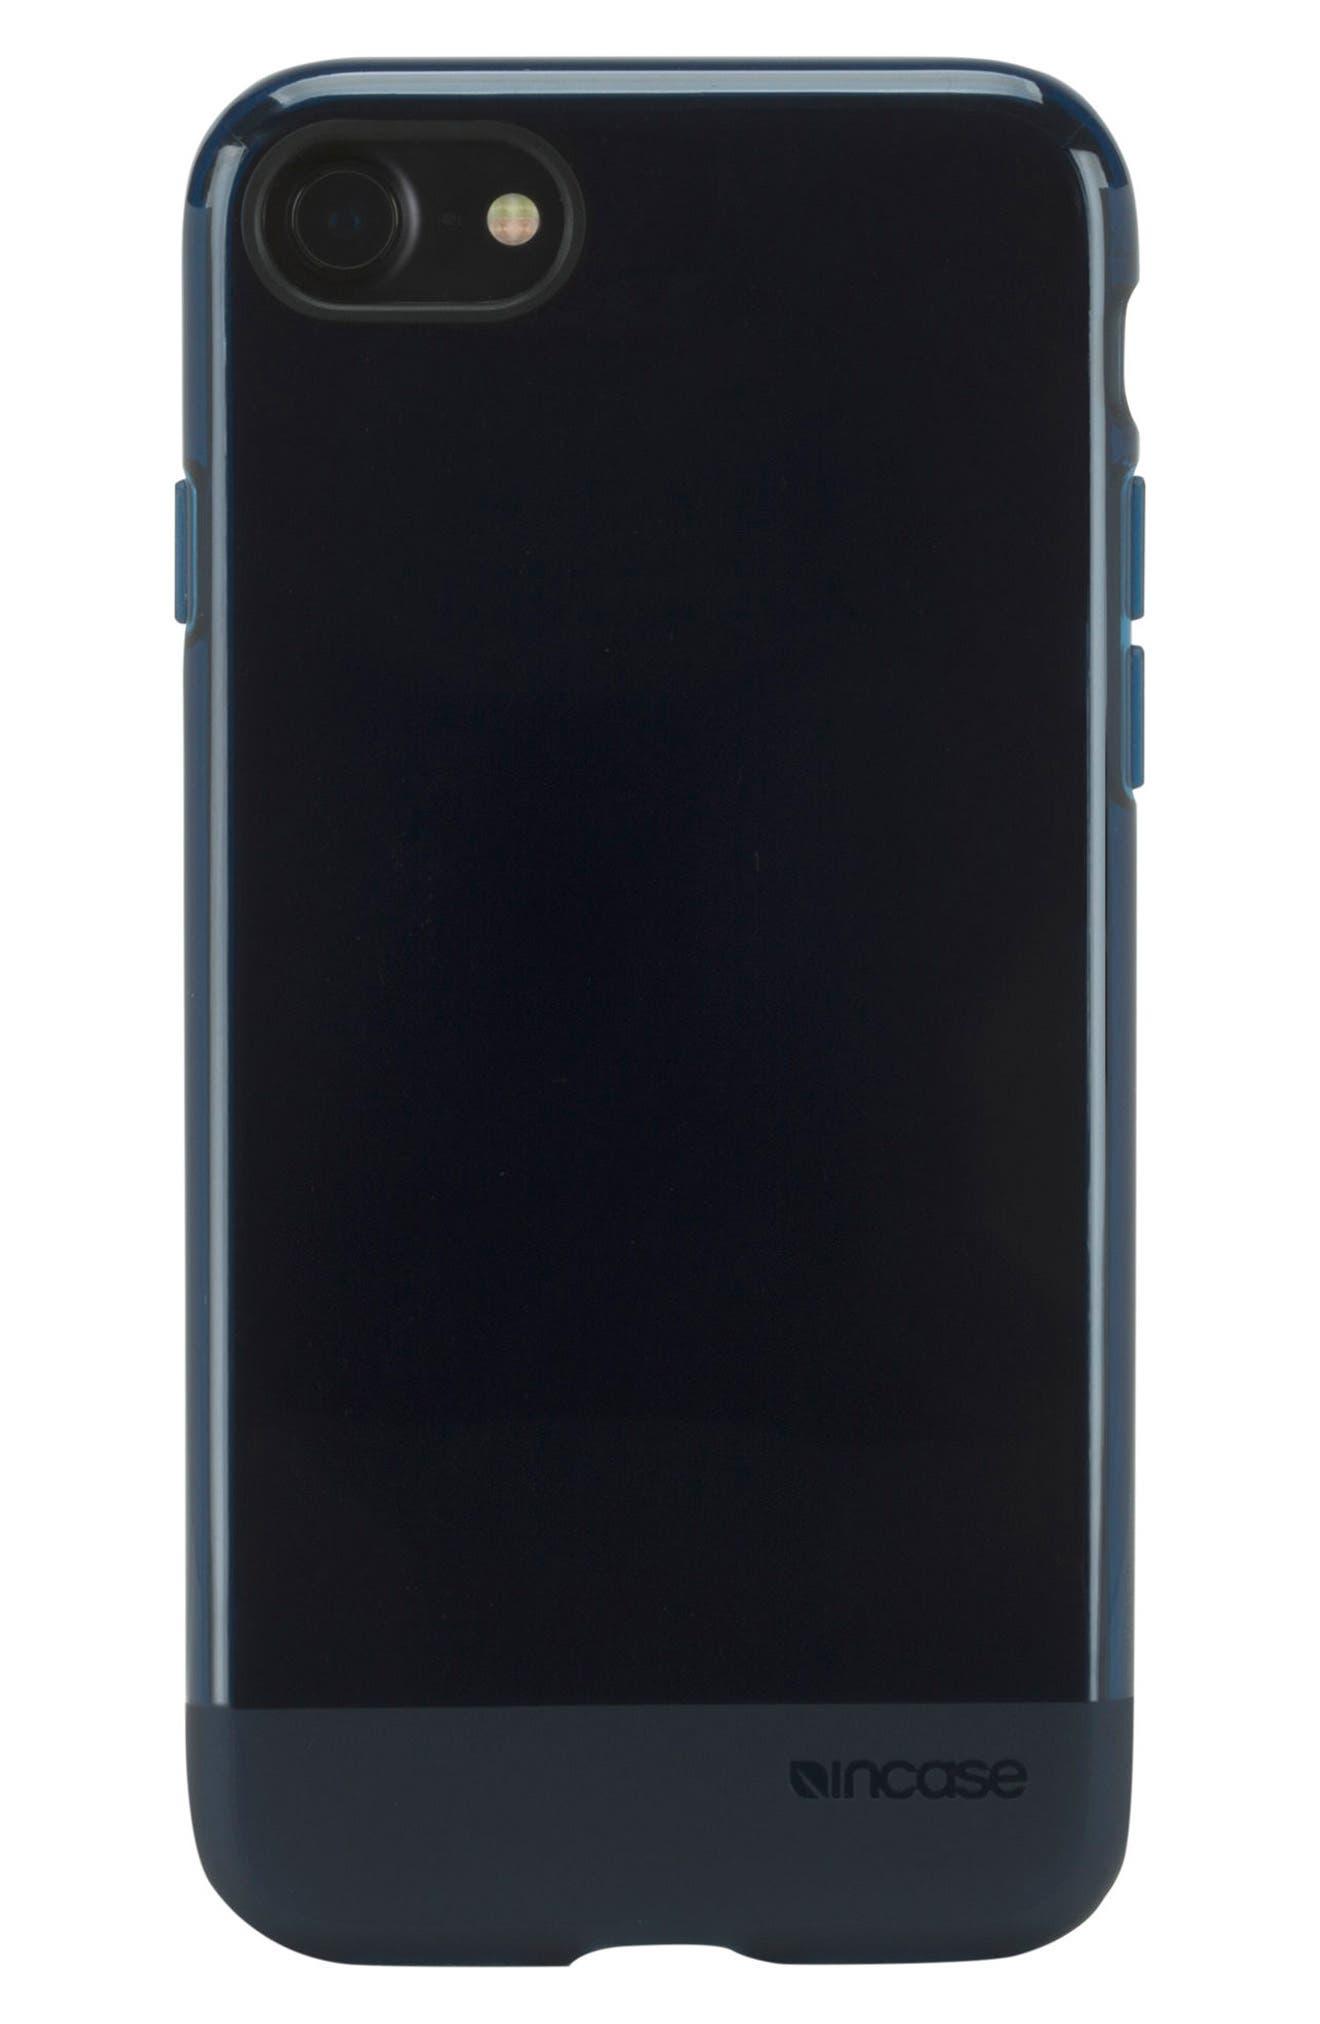 Incase Designs Protective iPhone 7/8 Case